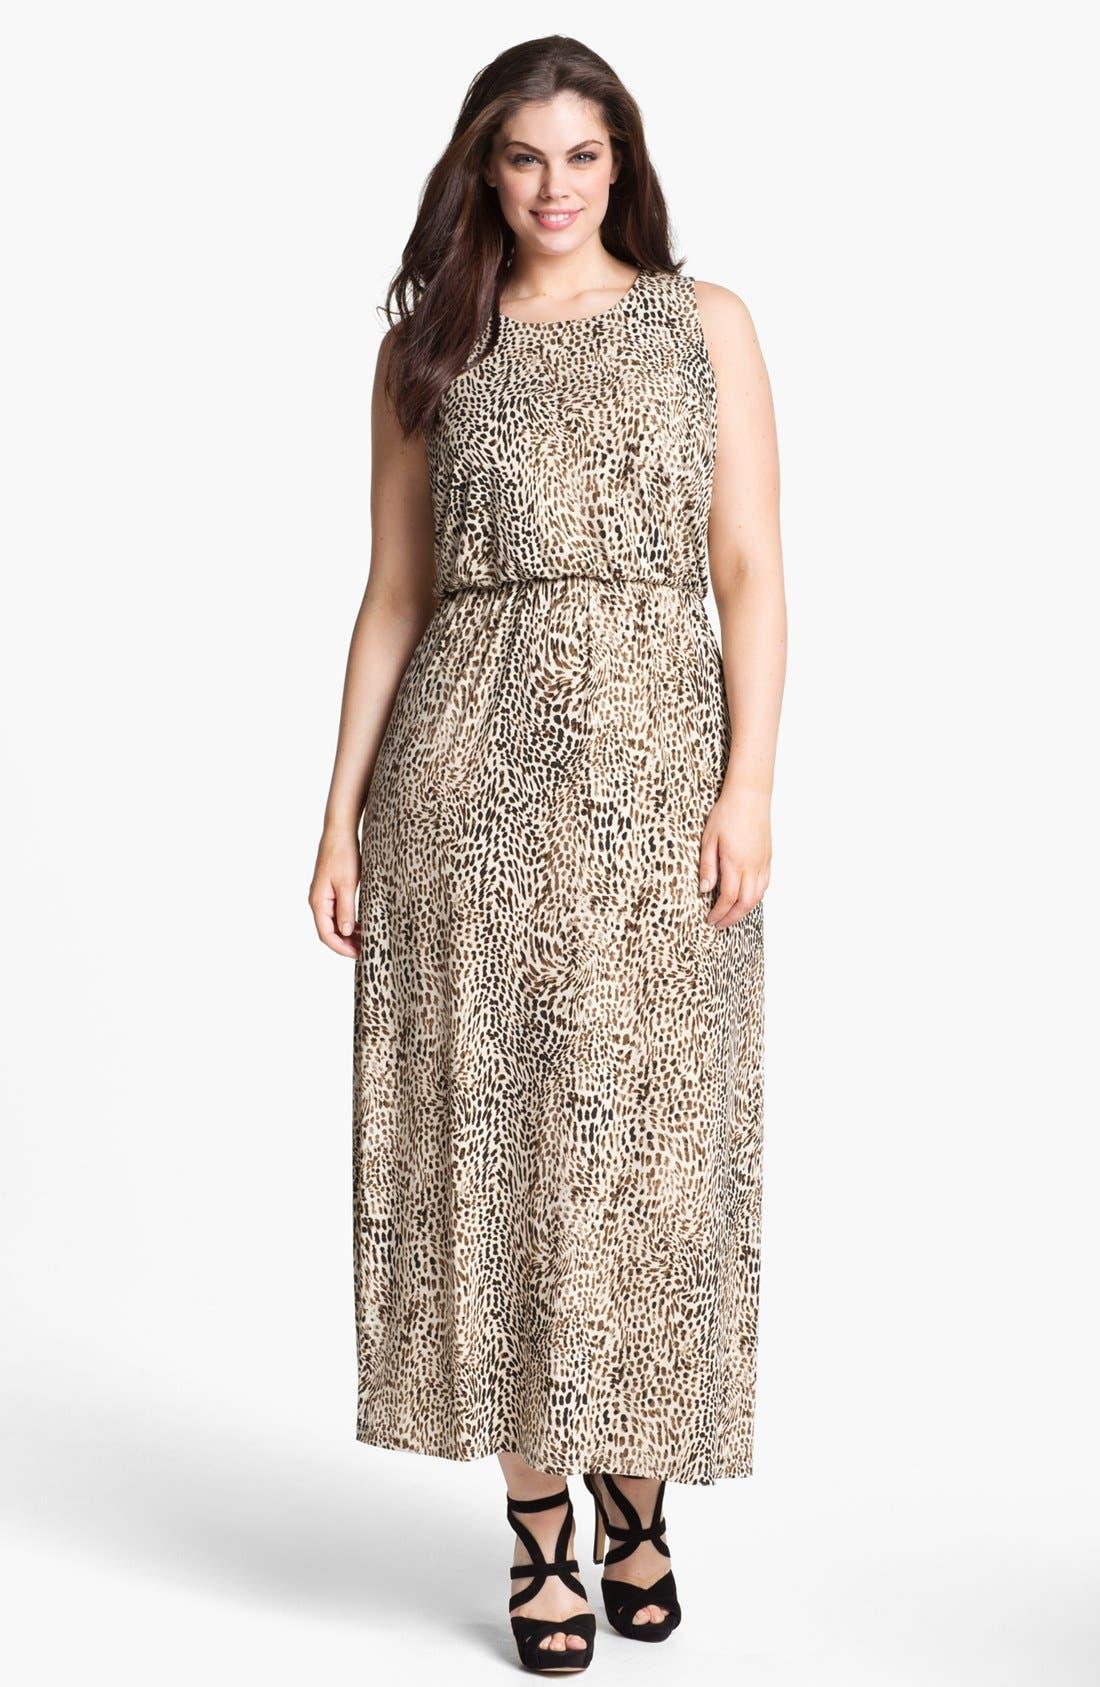 Main Image - Vince Camuto 'Rio' Cheetah Print Maxi Dress (Plus) (Online Only)